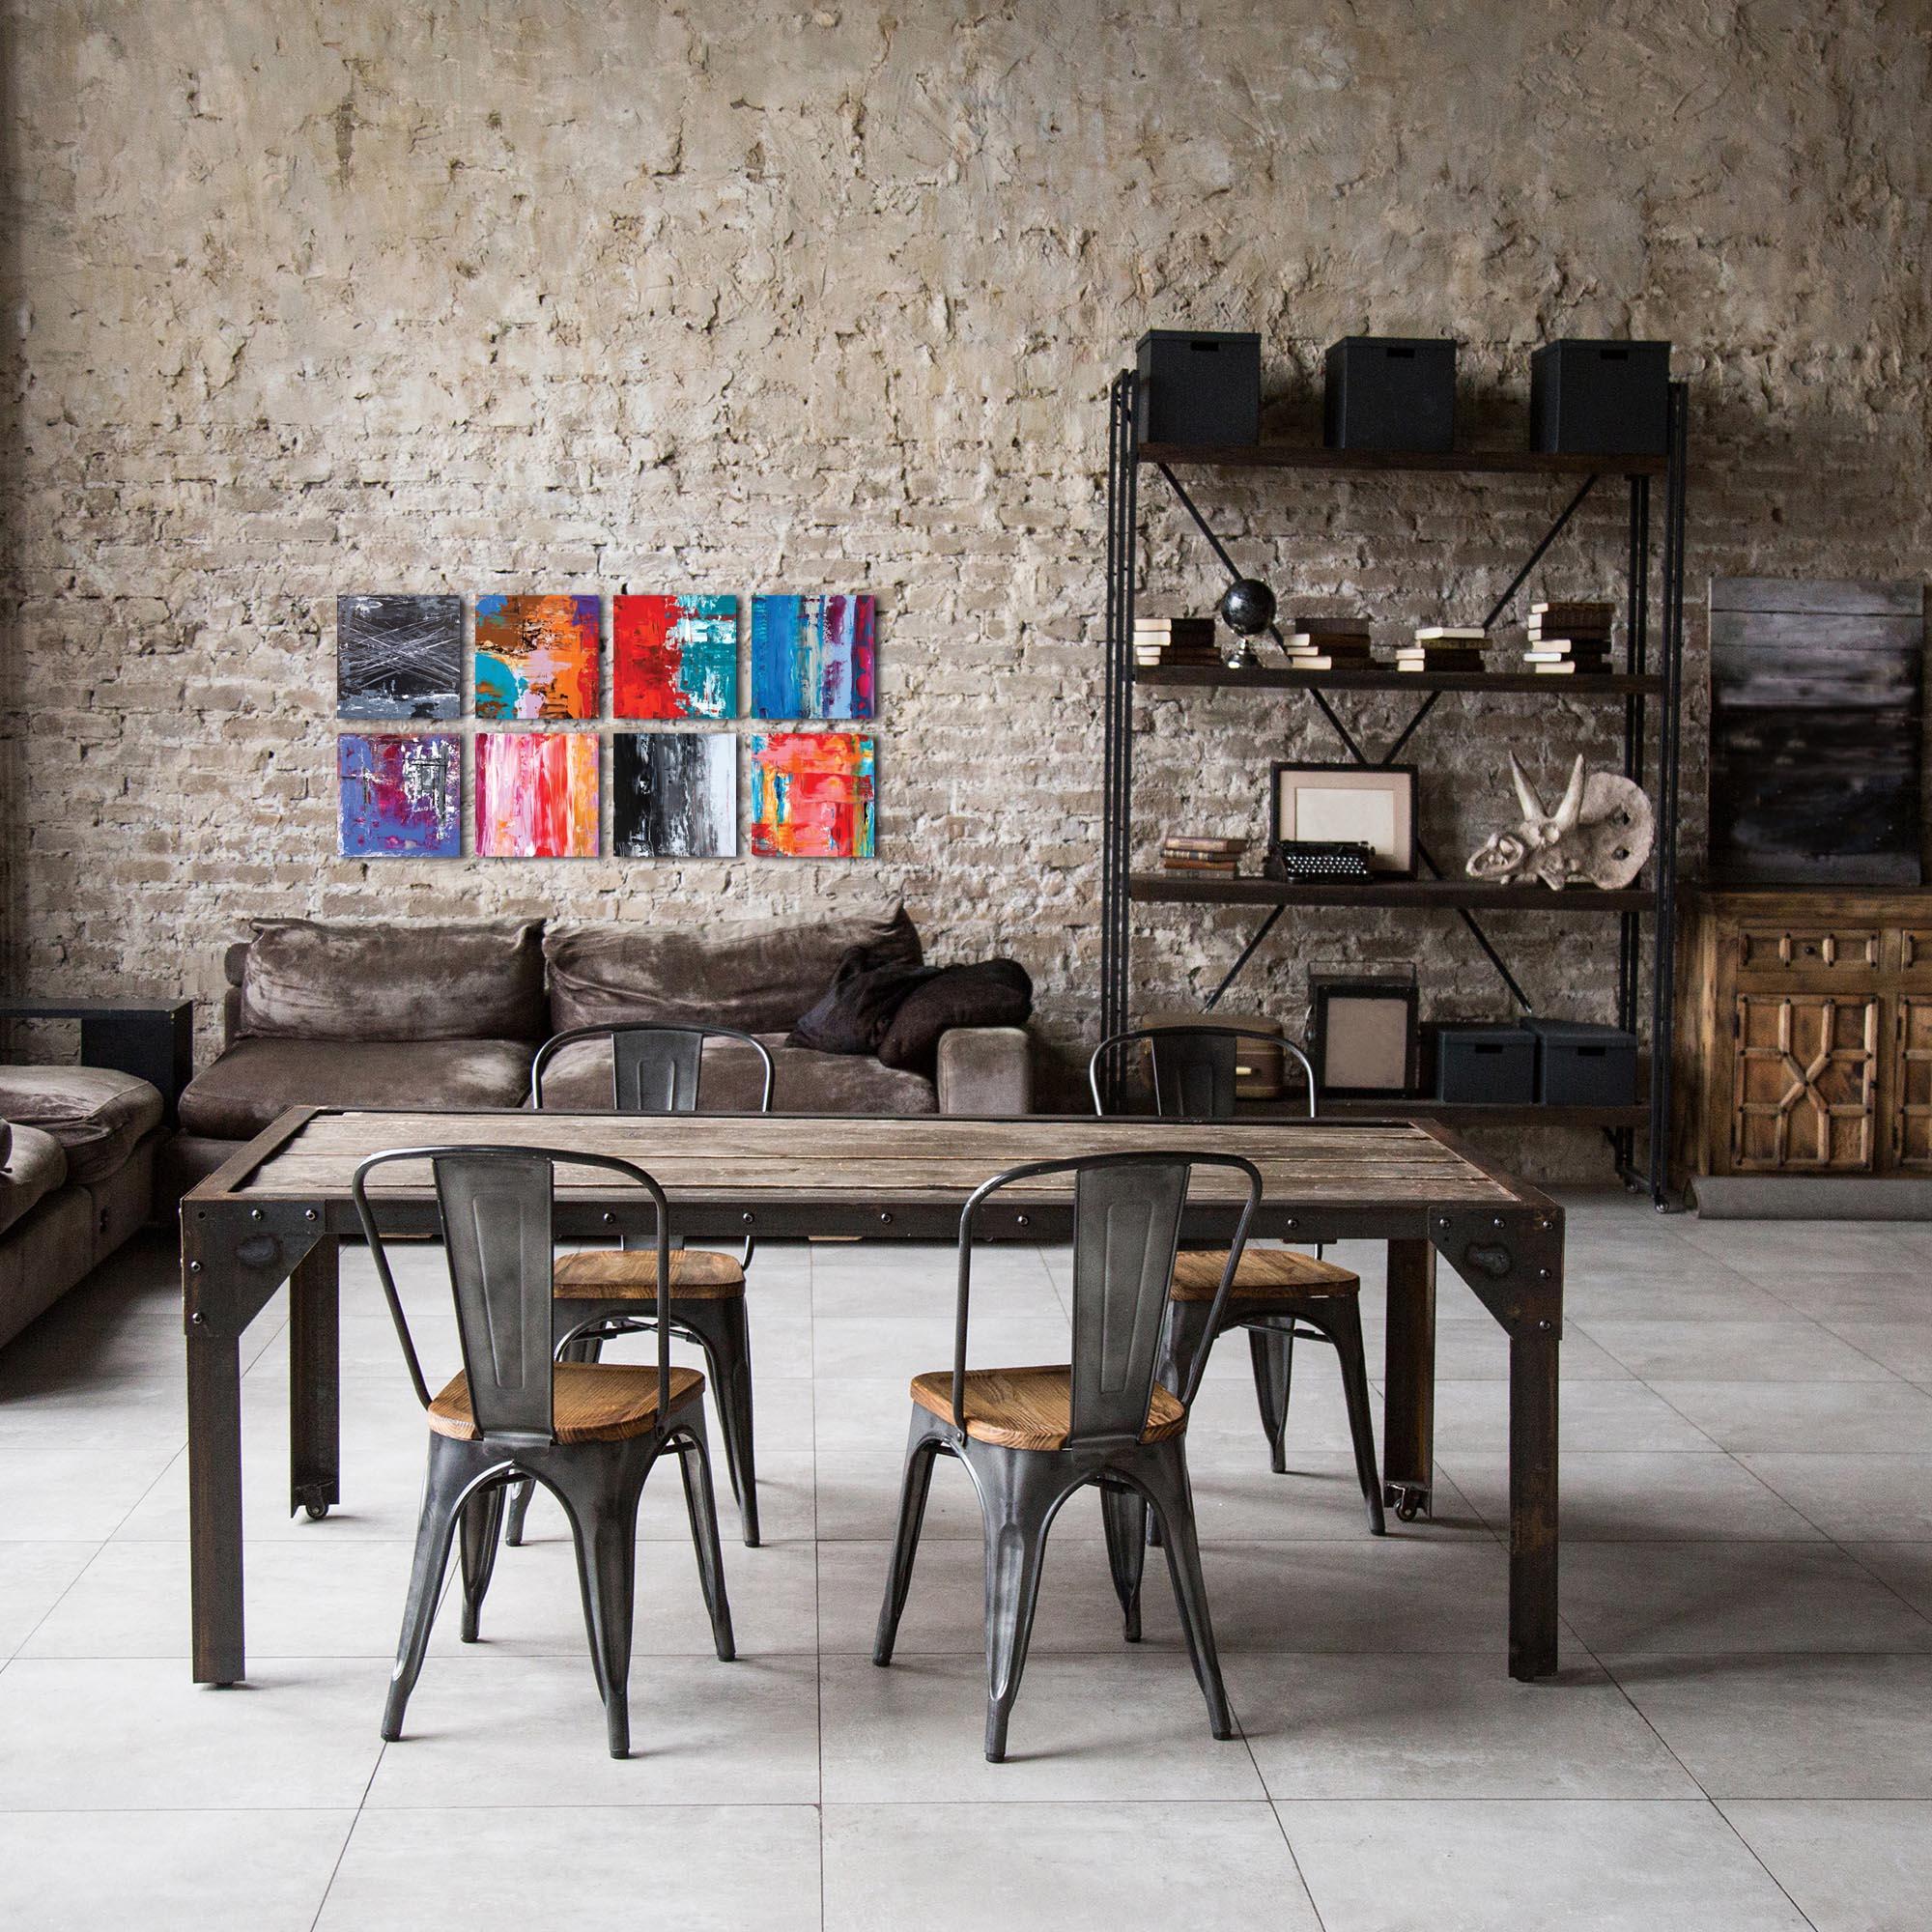 Abstract Wall Art 'Urban Windows' - Urban Decor on Metal or Plexiglass - Lifestyle View